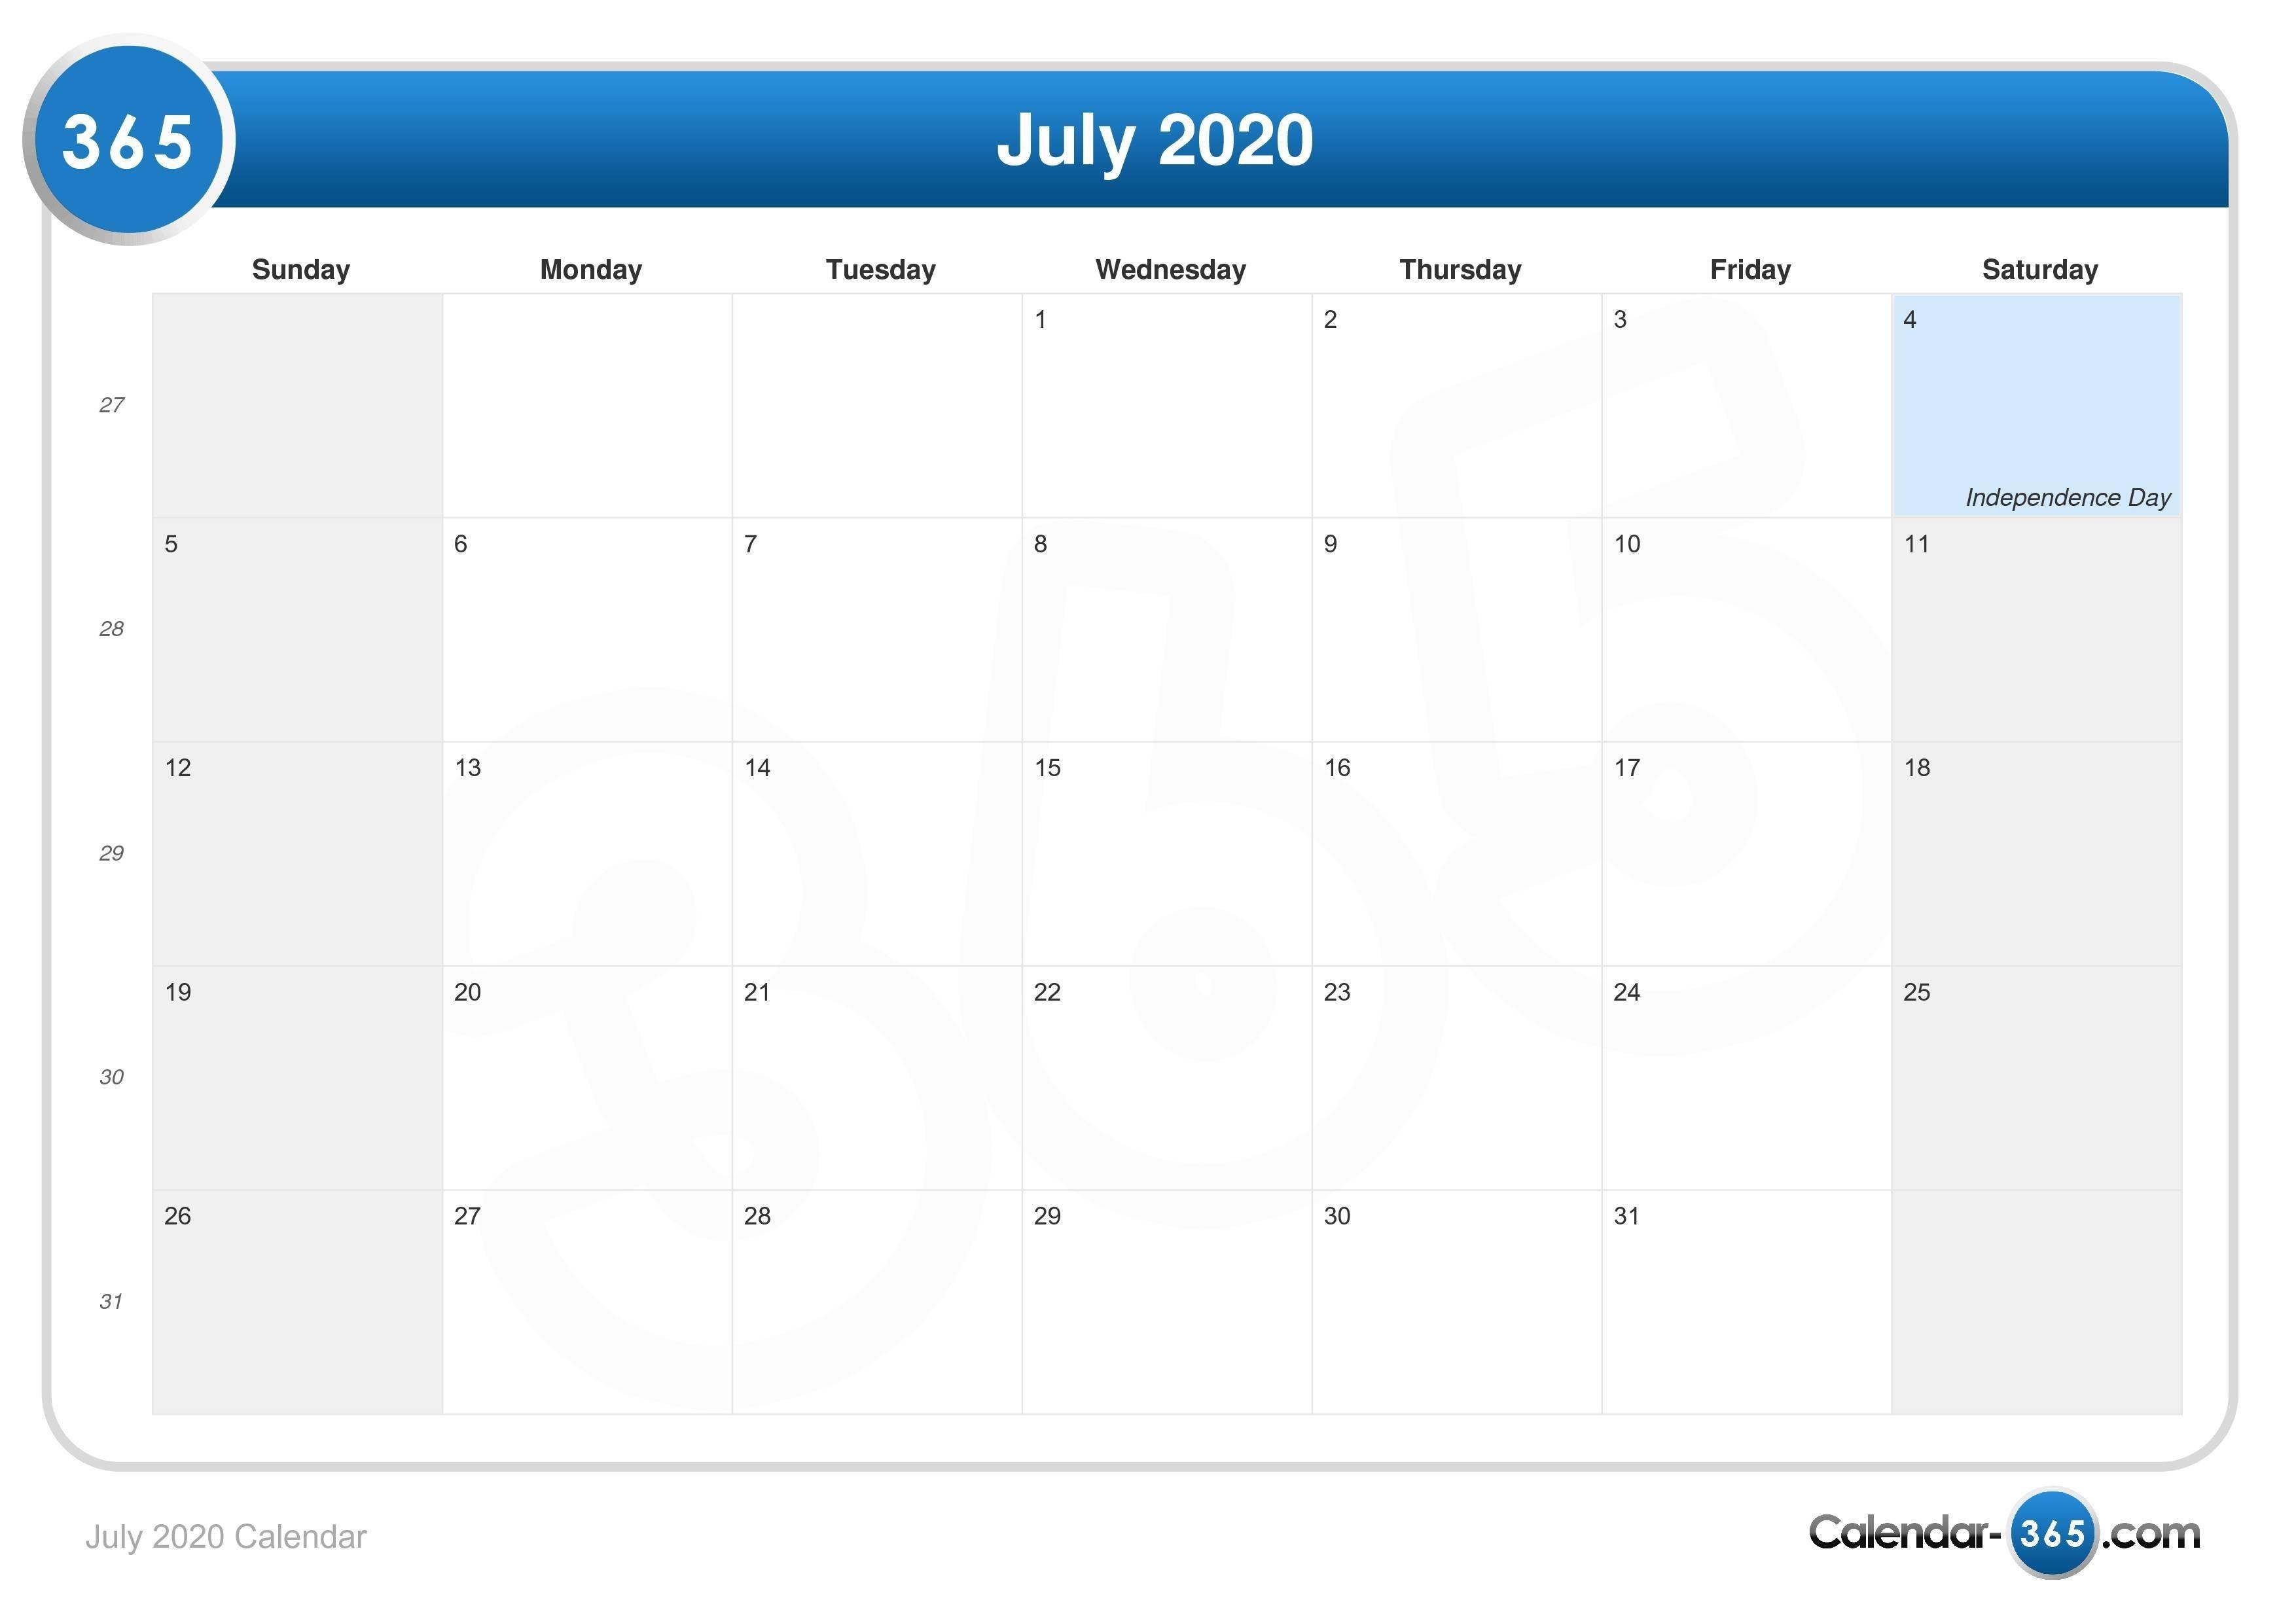 July 2020 Calendar-July 2020 Calendar With Holidays India